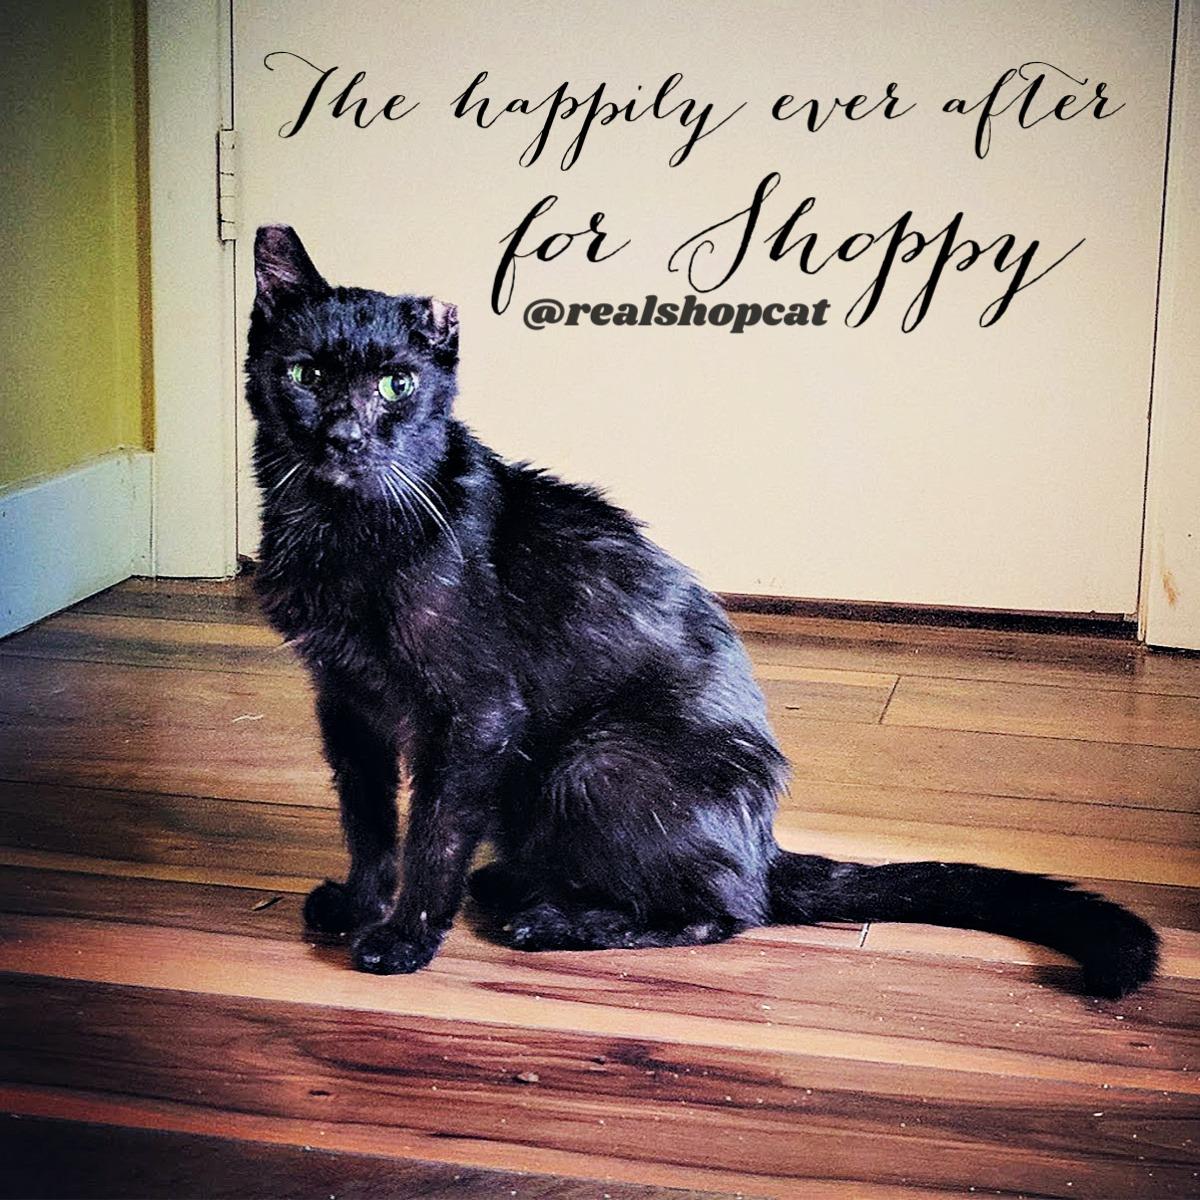 shoppy_realshopcat_catwisdom101